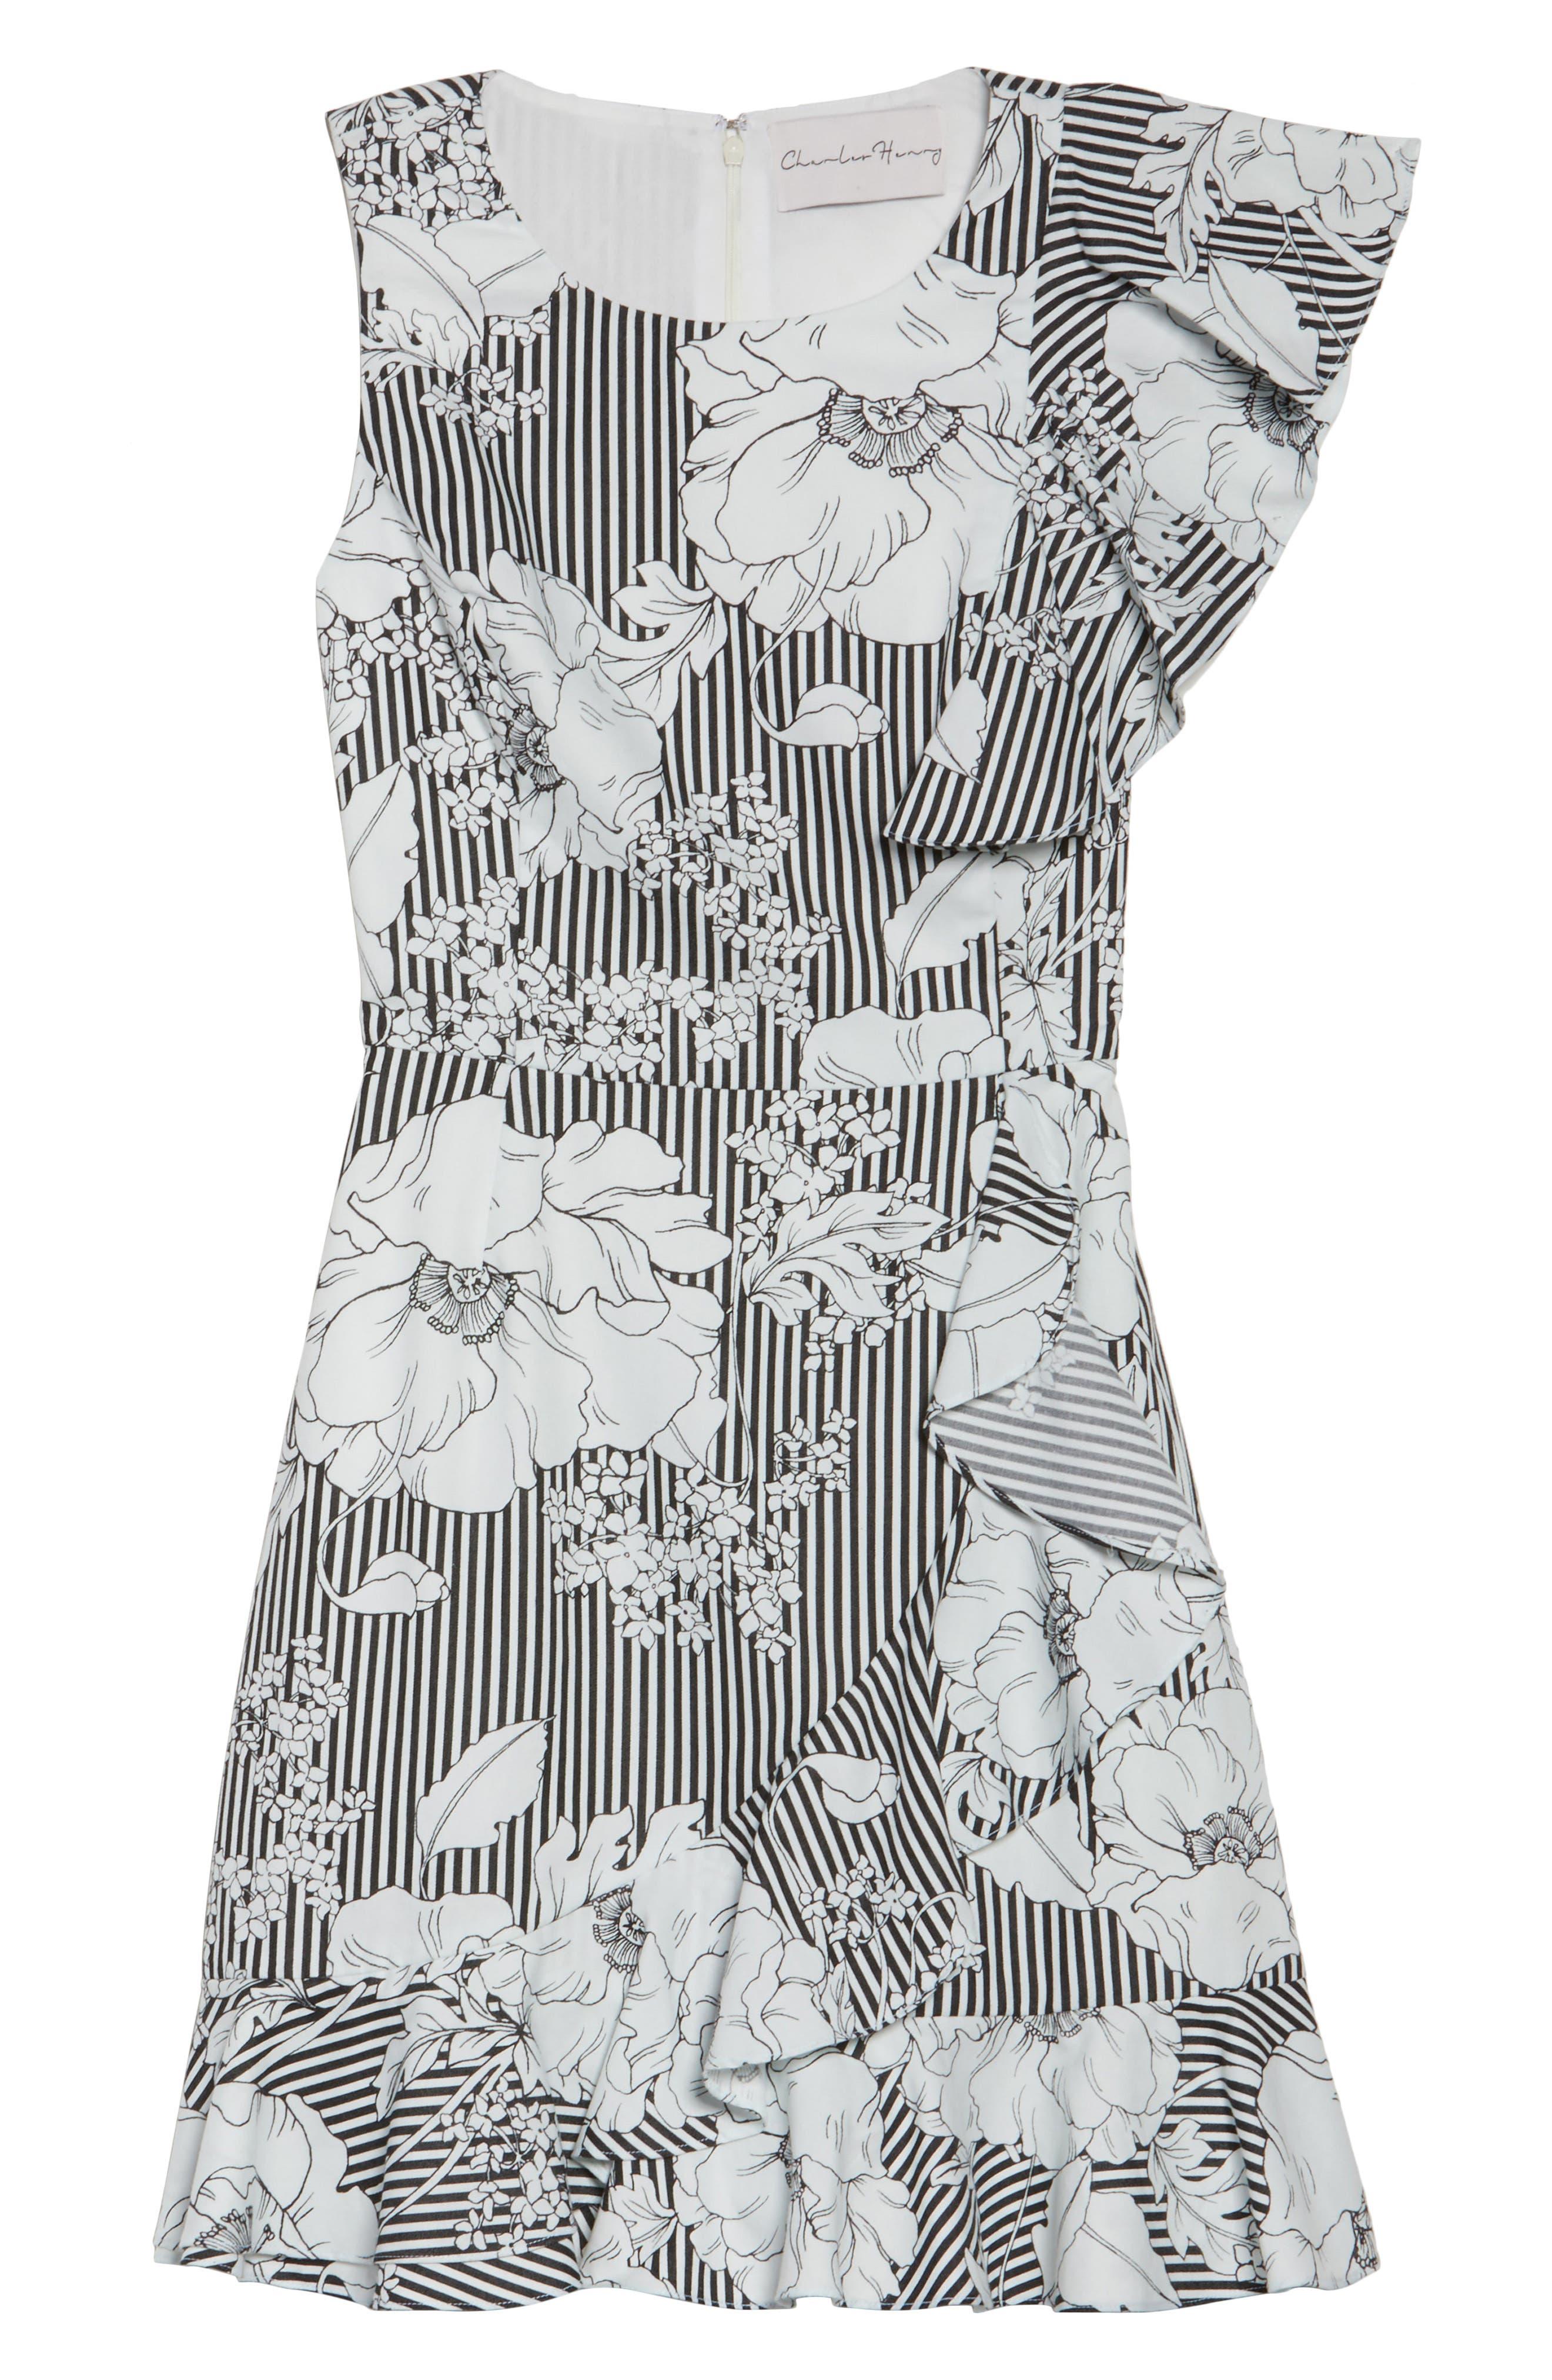 Floral Asymmetrical Ruffle Dress,                             Alternate thumbnail 6, color,                             Black White Floral